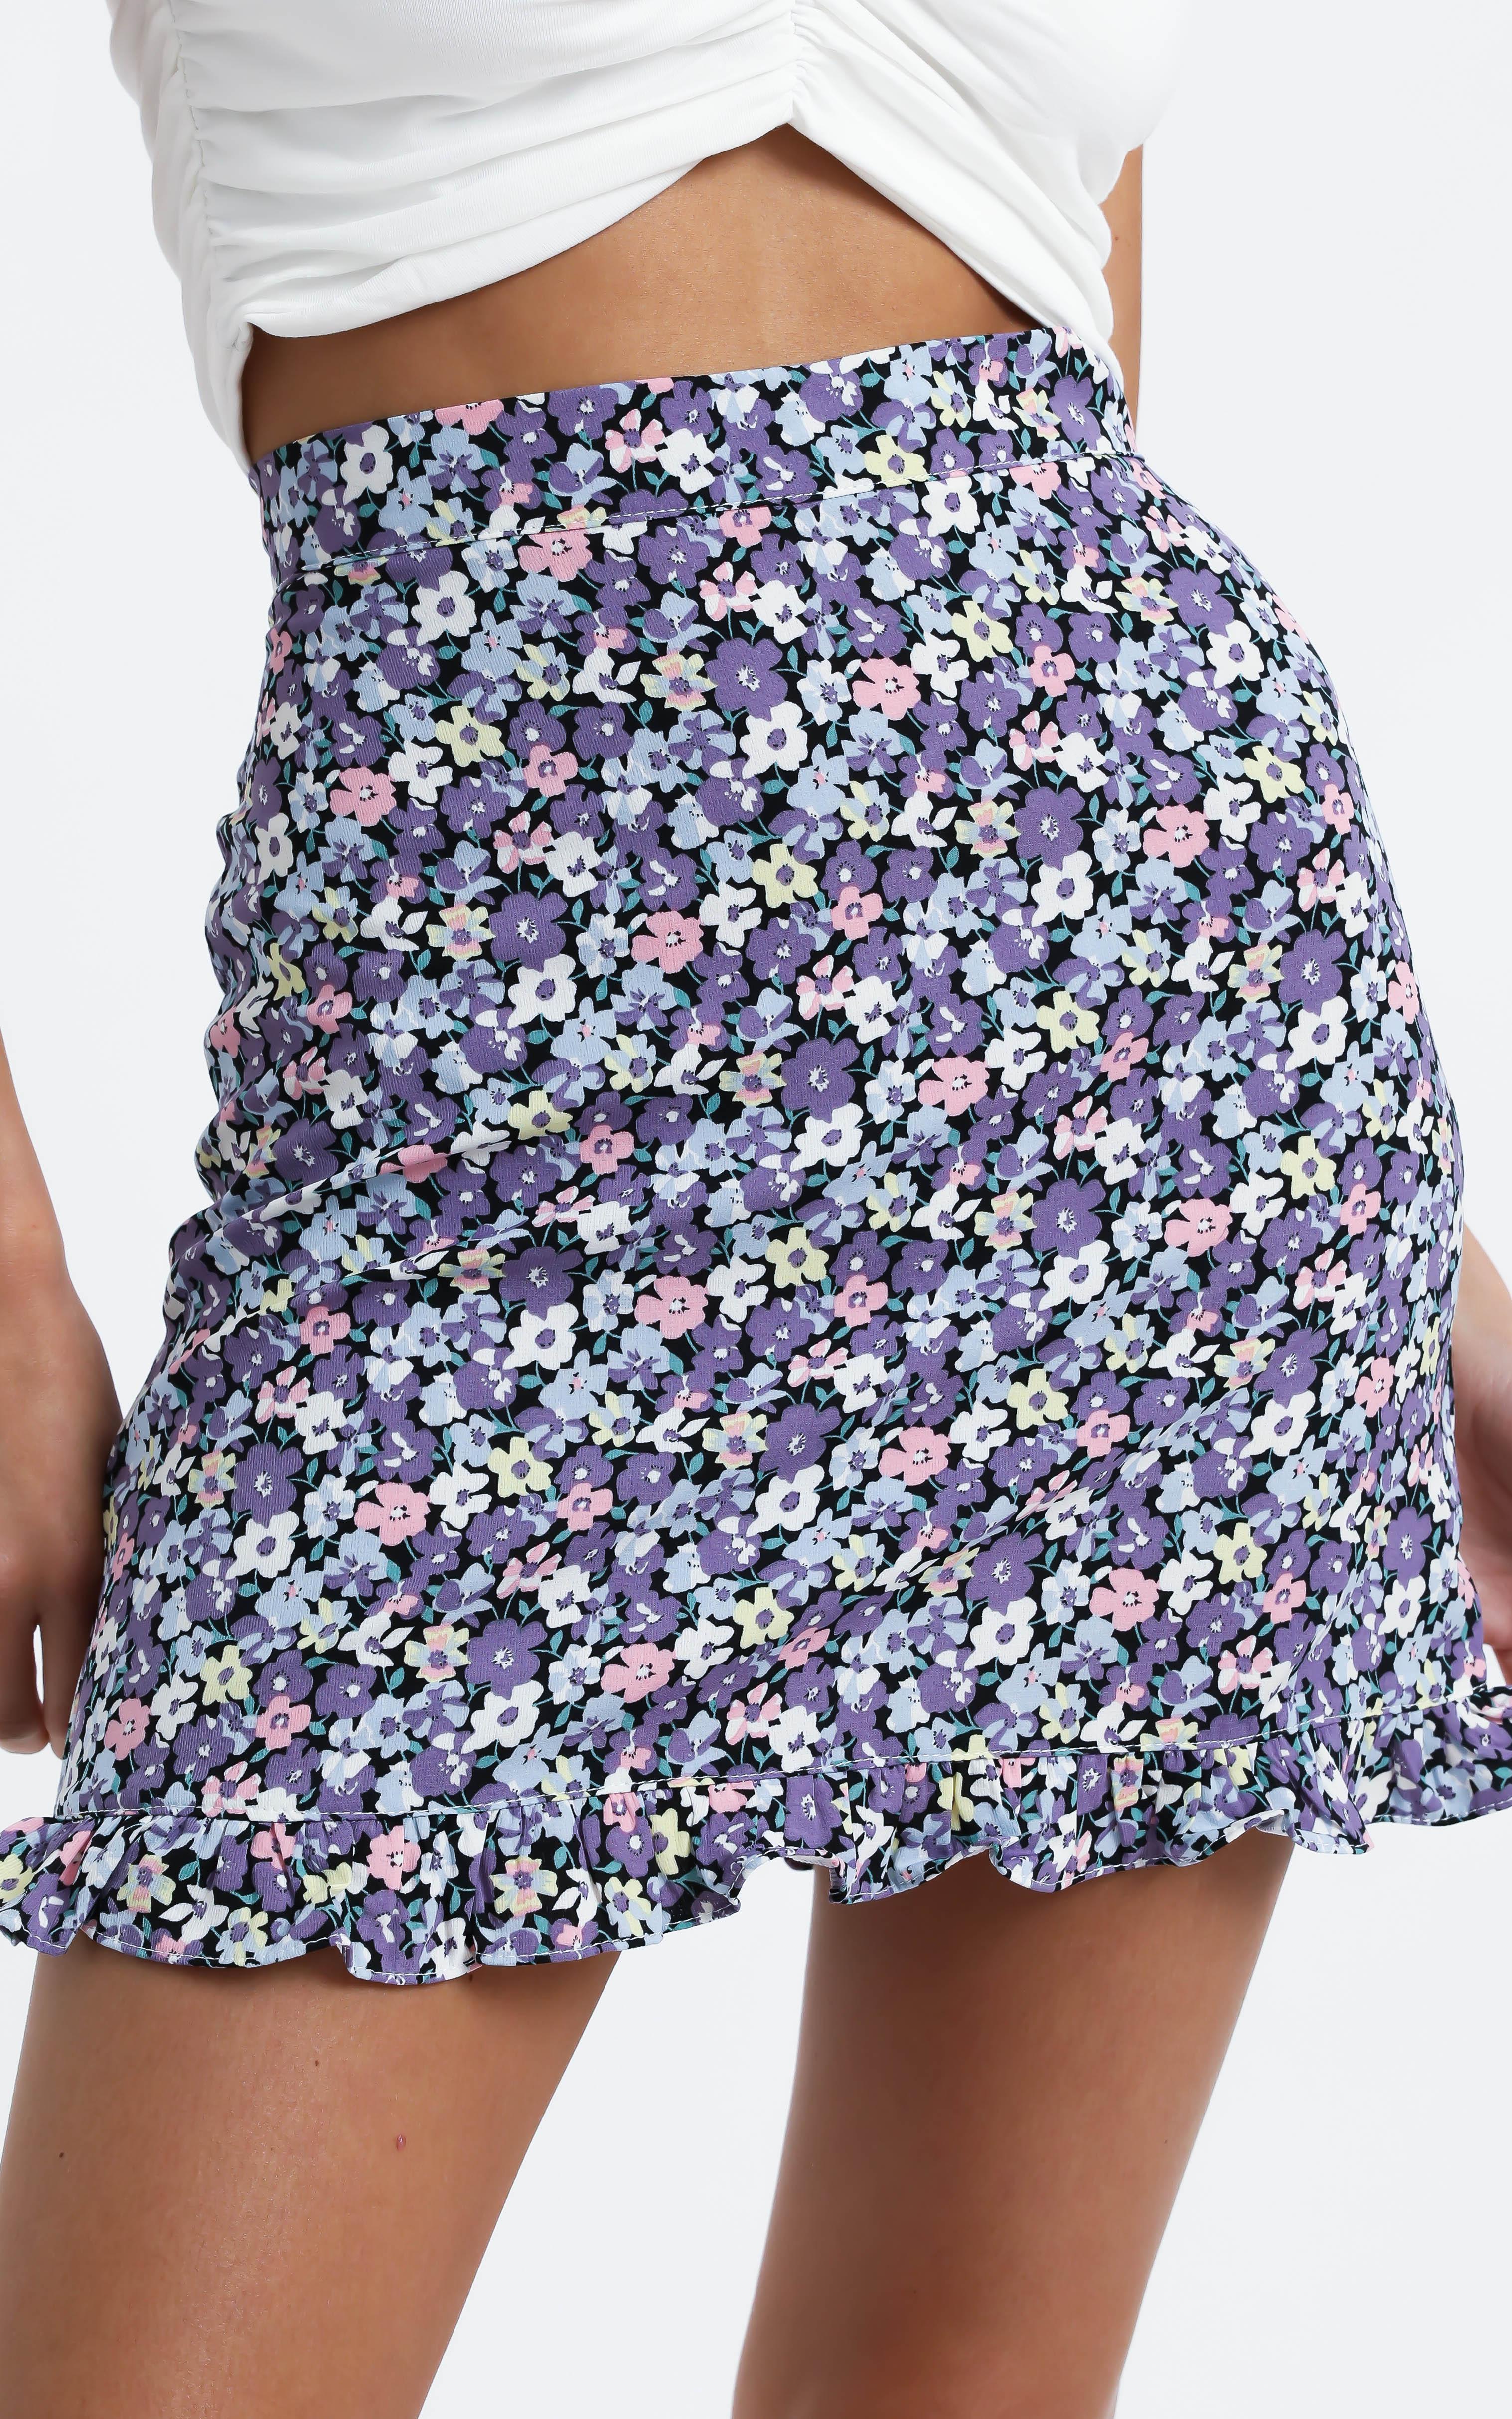 Bellissima Skirt in Purple Floral - 12 (L), Purple, hi-res image number null